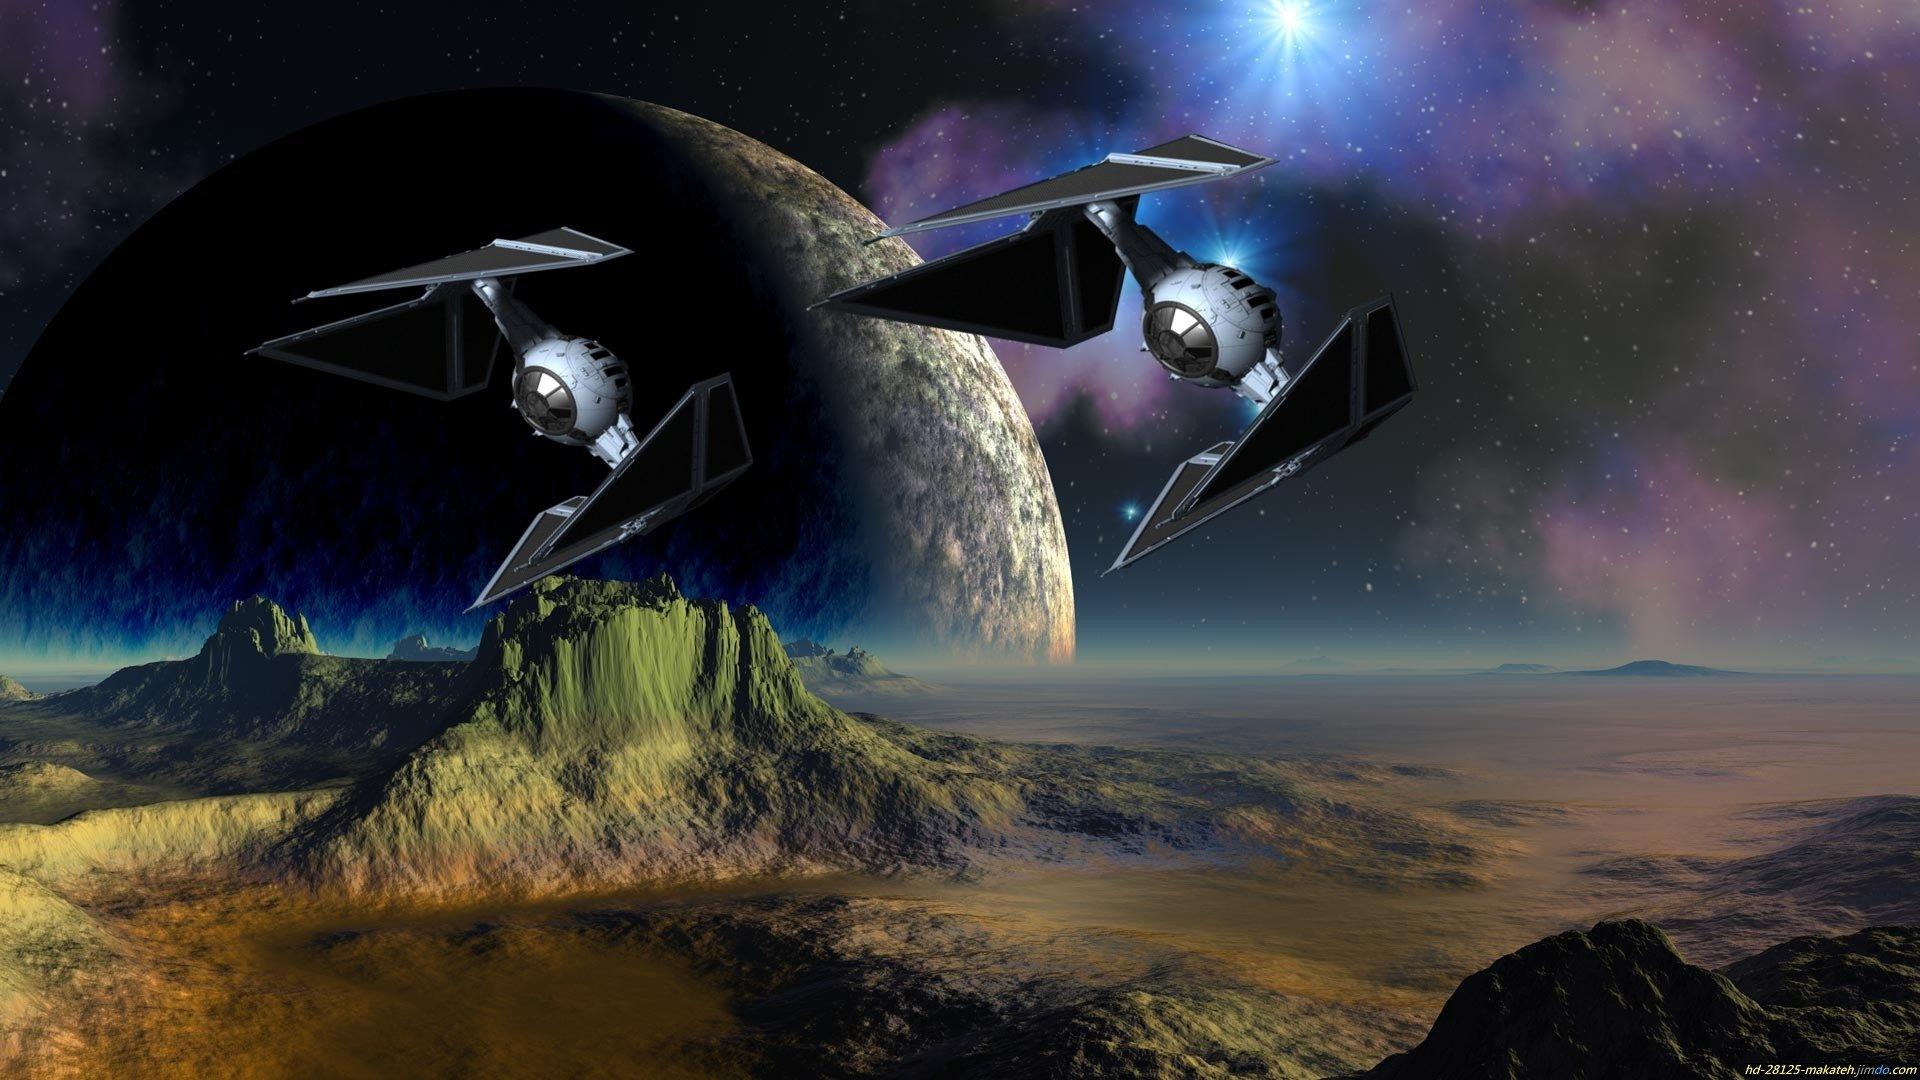 Star Wars C HD Wallpaper | Background Image | 1920x1080 ...